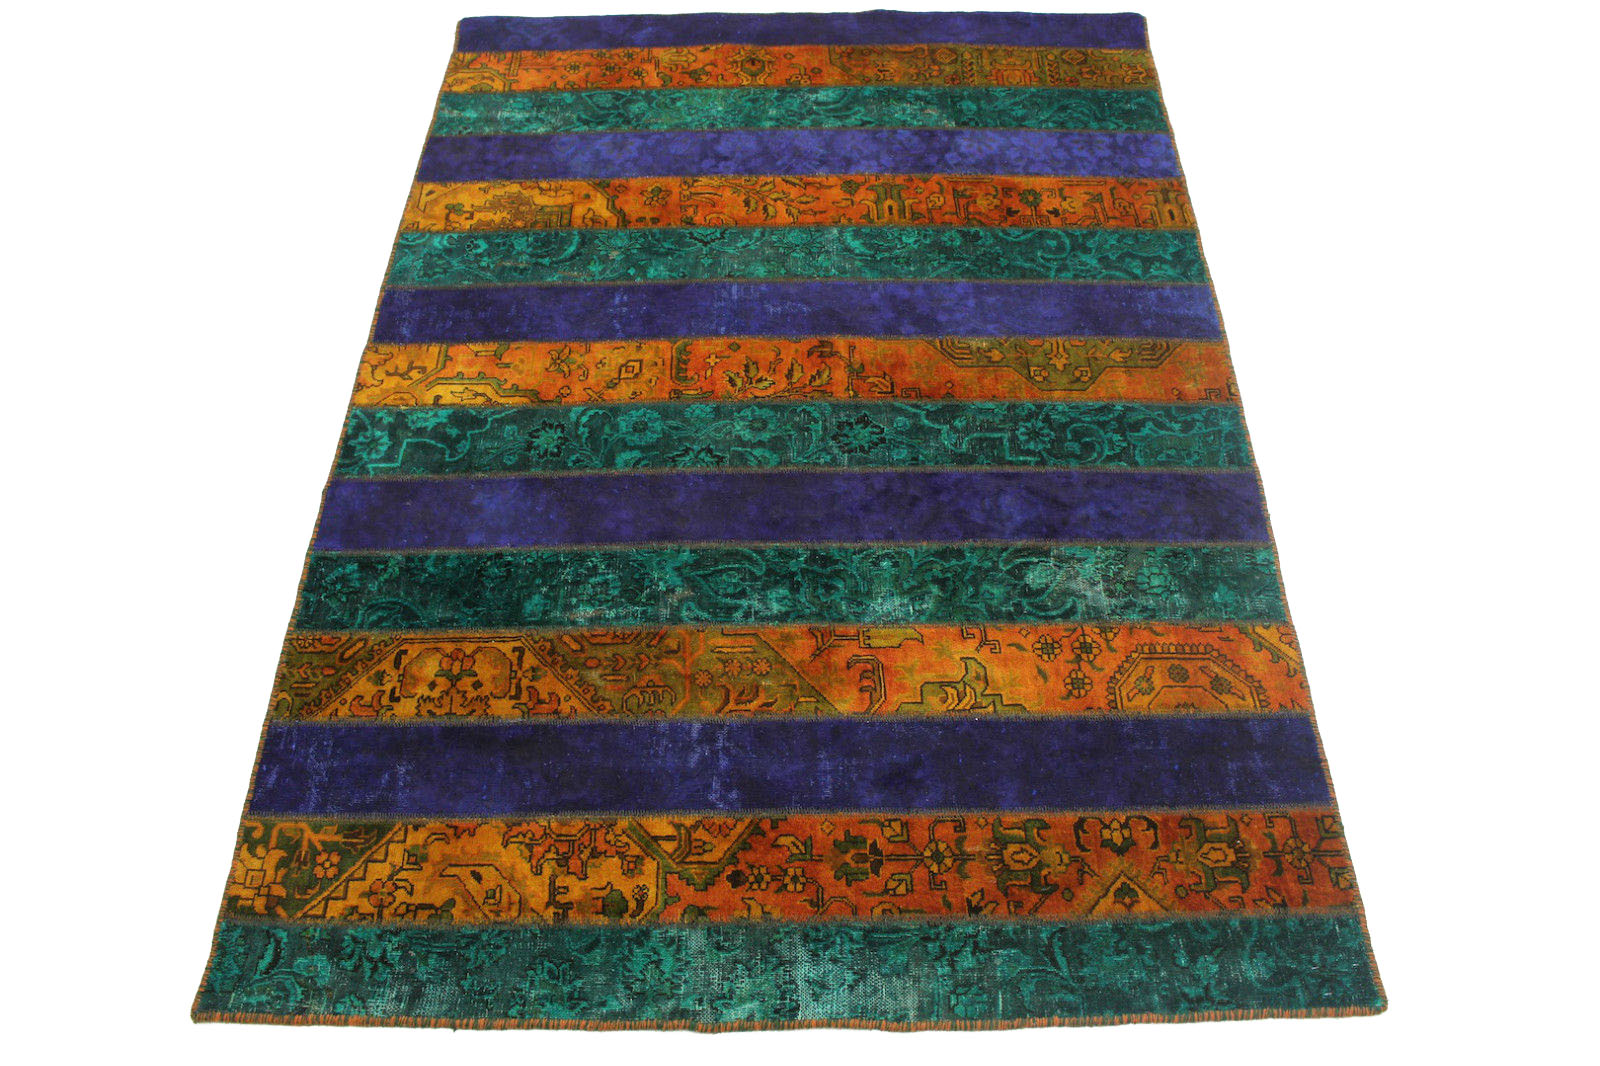 patchwork teppich orange lila t rkis in 250x170cm 1001 1720 bei kaufen. Black Bedroom Furniture Sets. Home Design Ideas